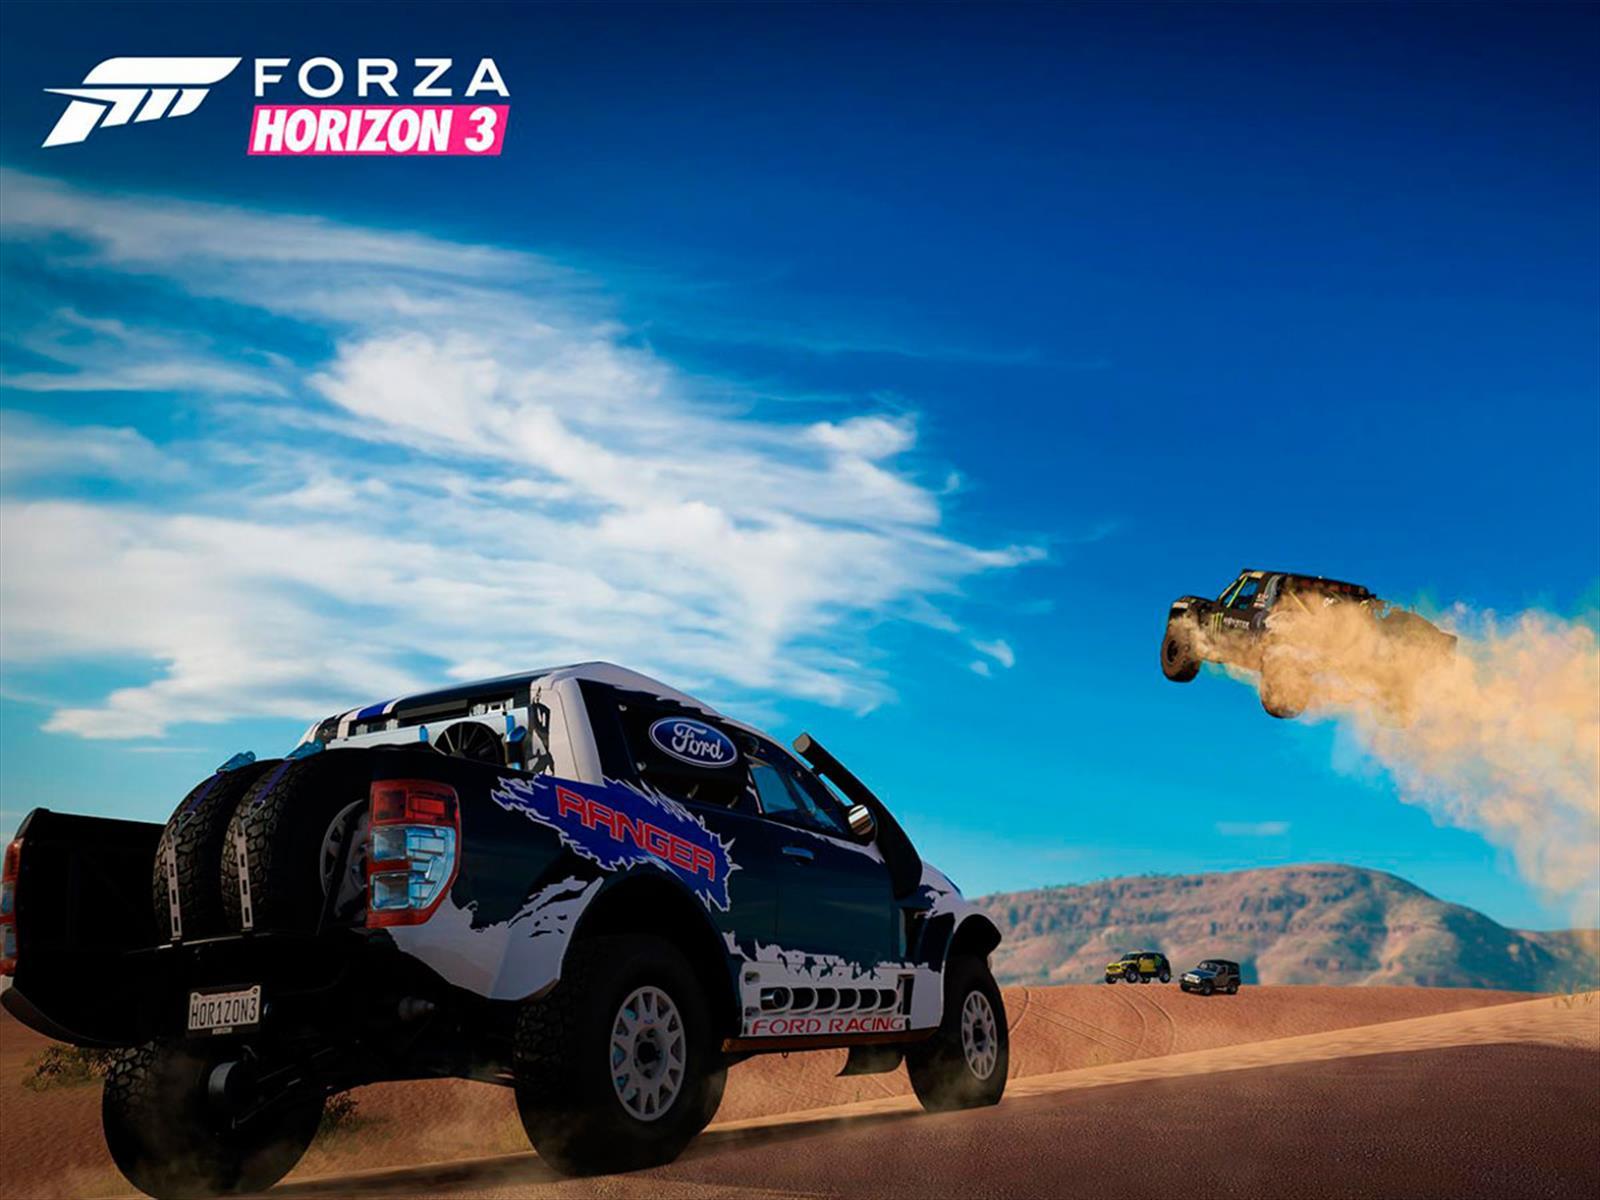 Video: Forza Horizon 3 prepara motores